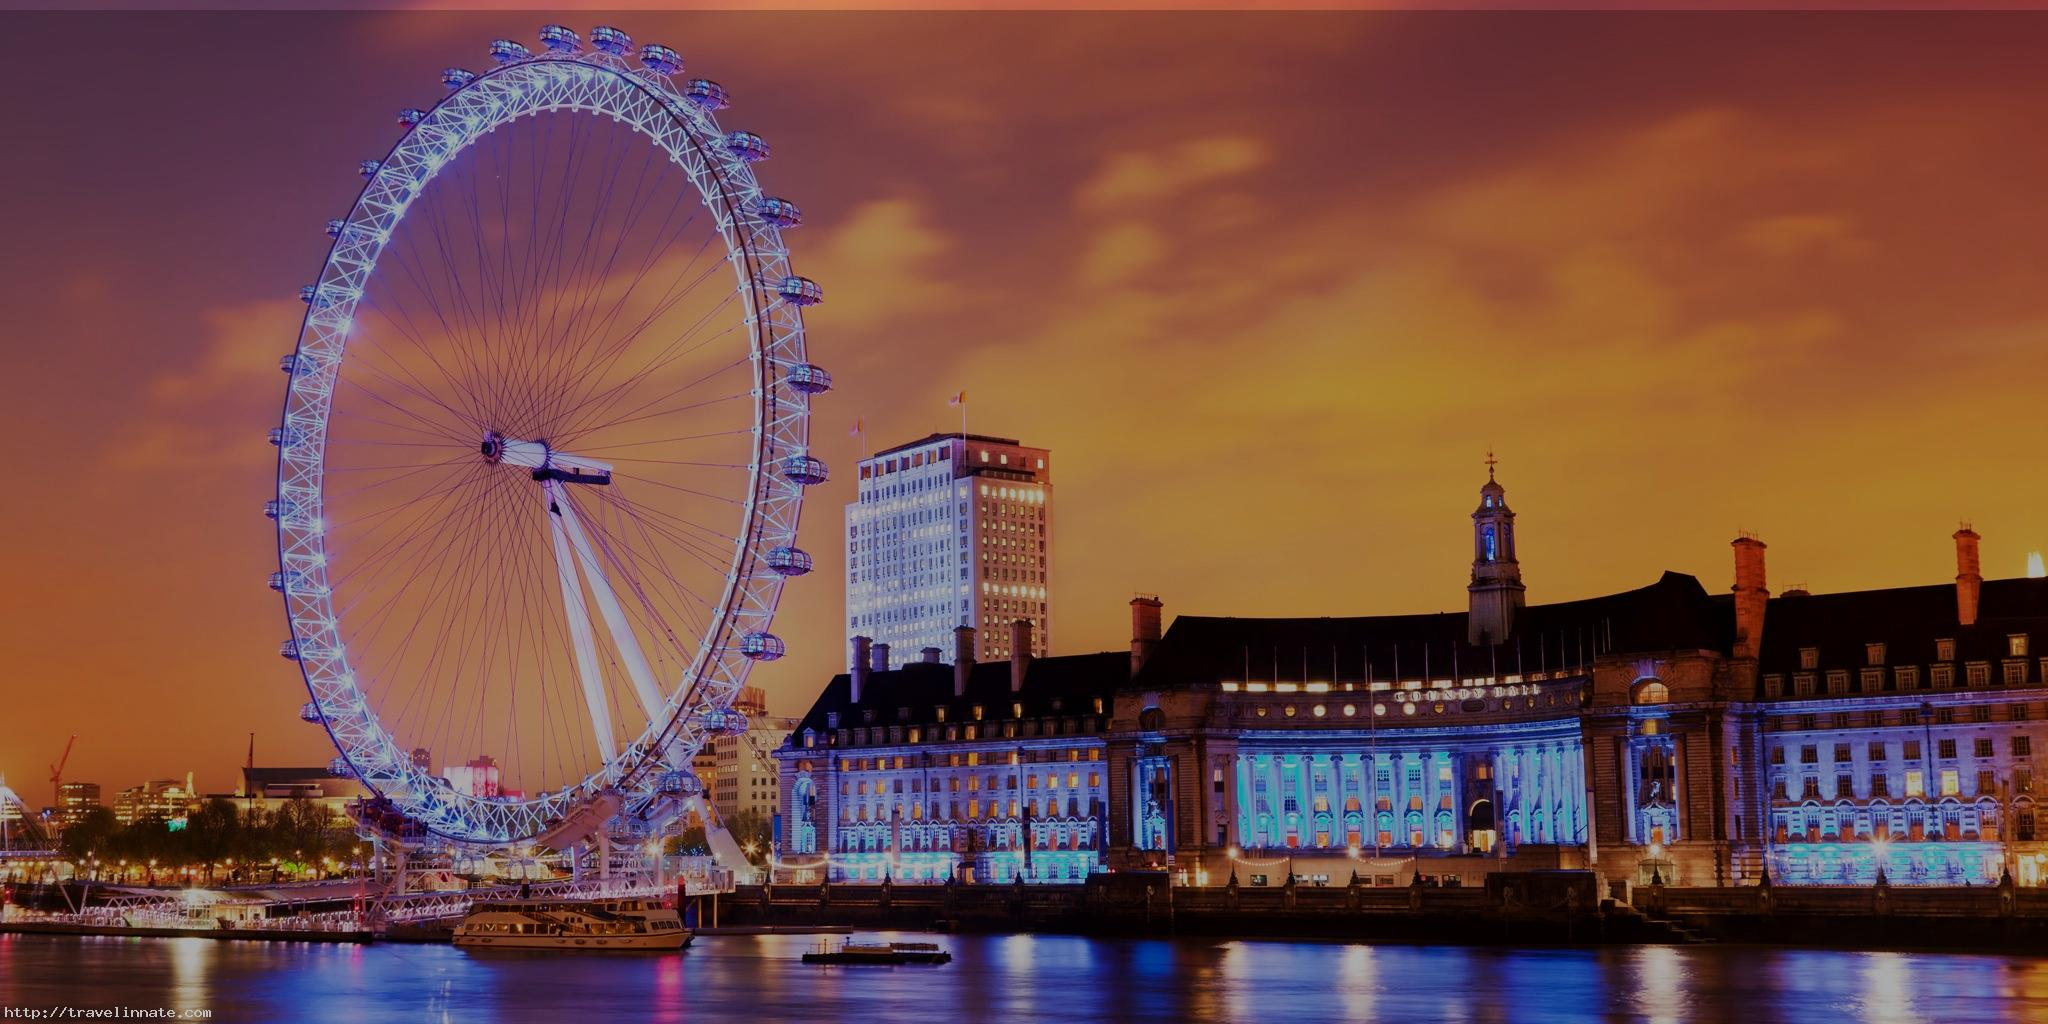 Tableau Conference on Tour London